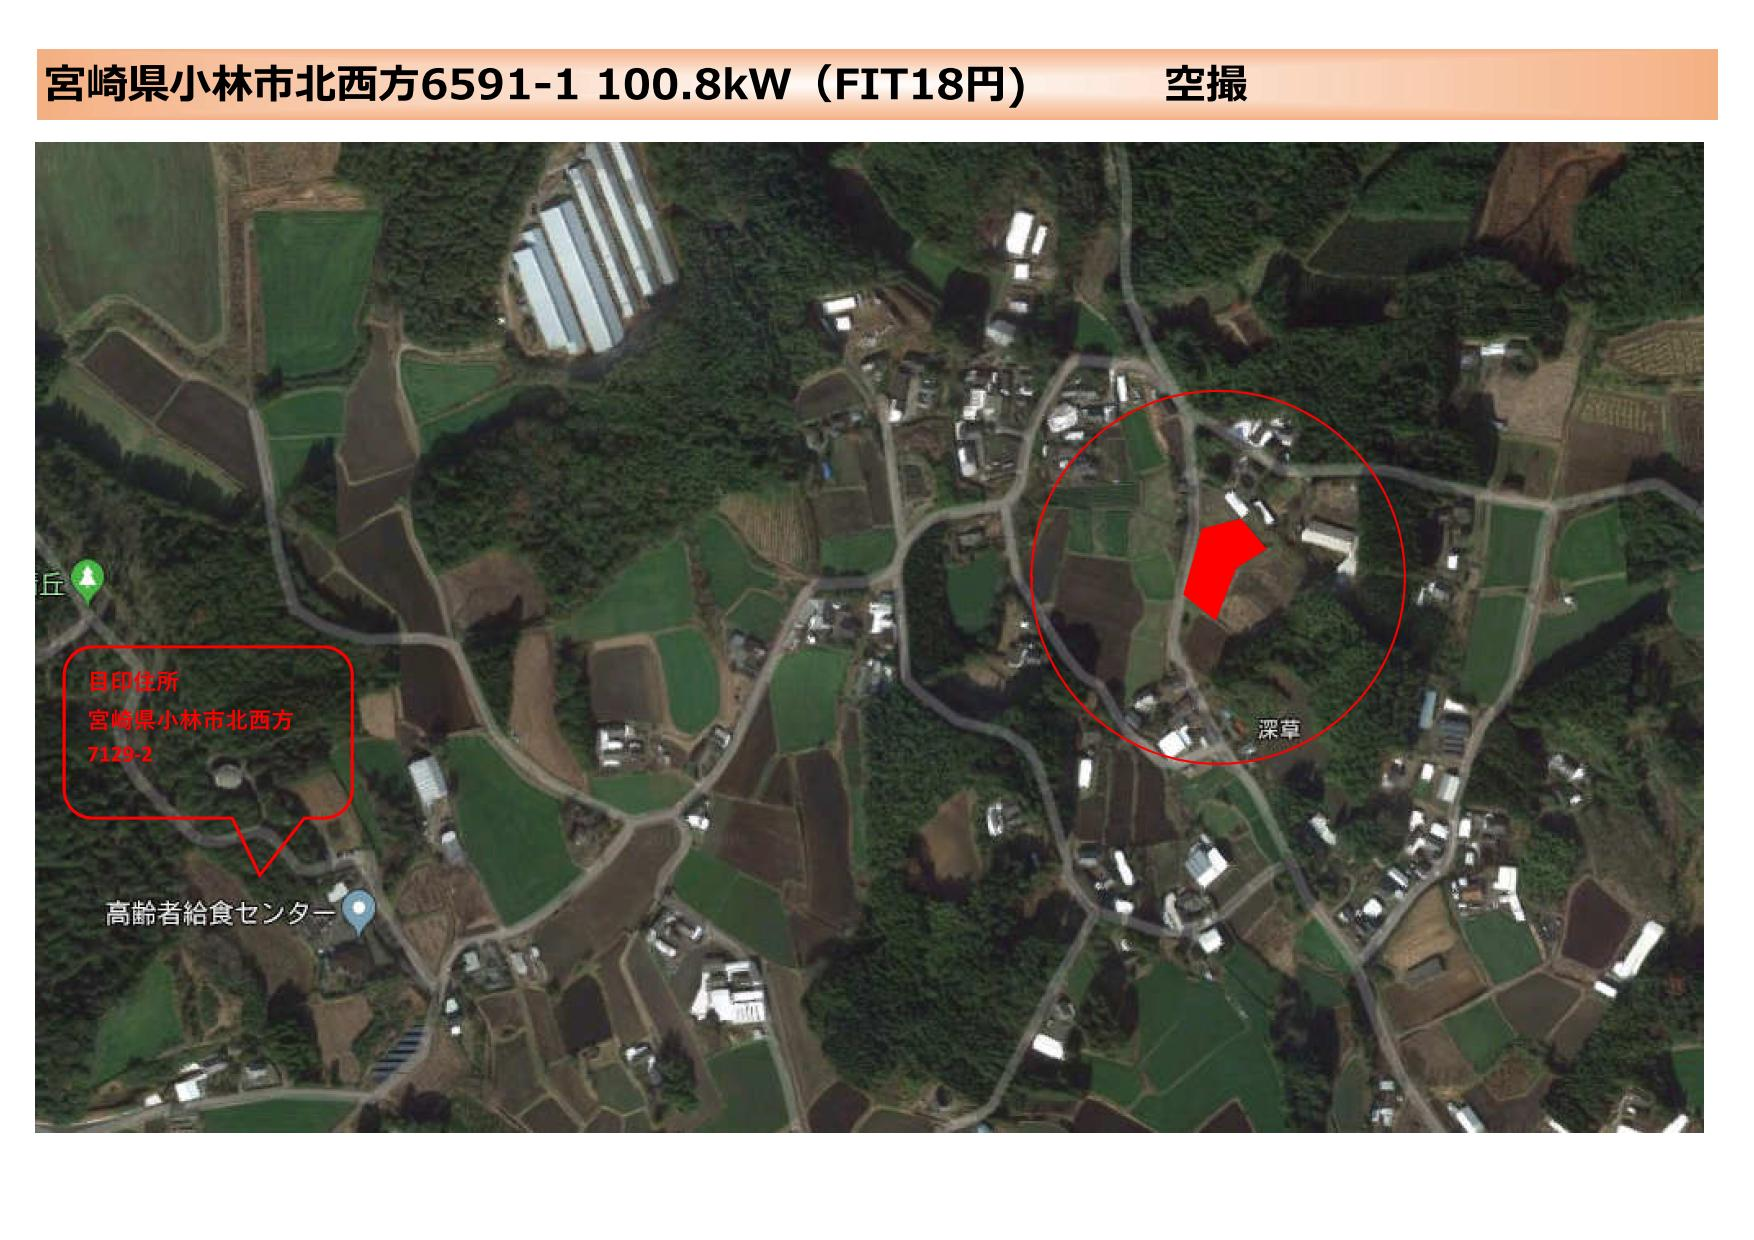 【SB】FIT18円 宮崎県小林市北西方発電所のメイン画像